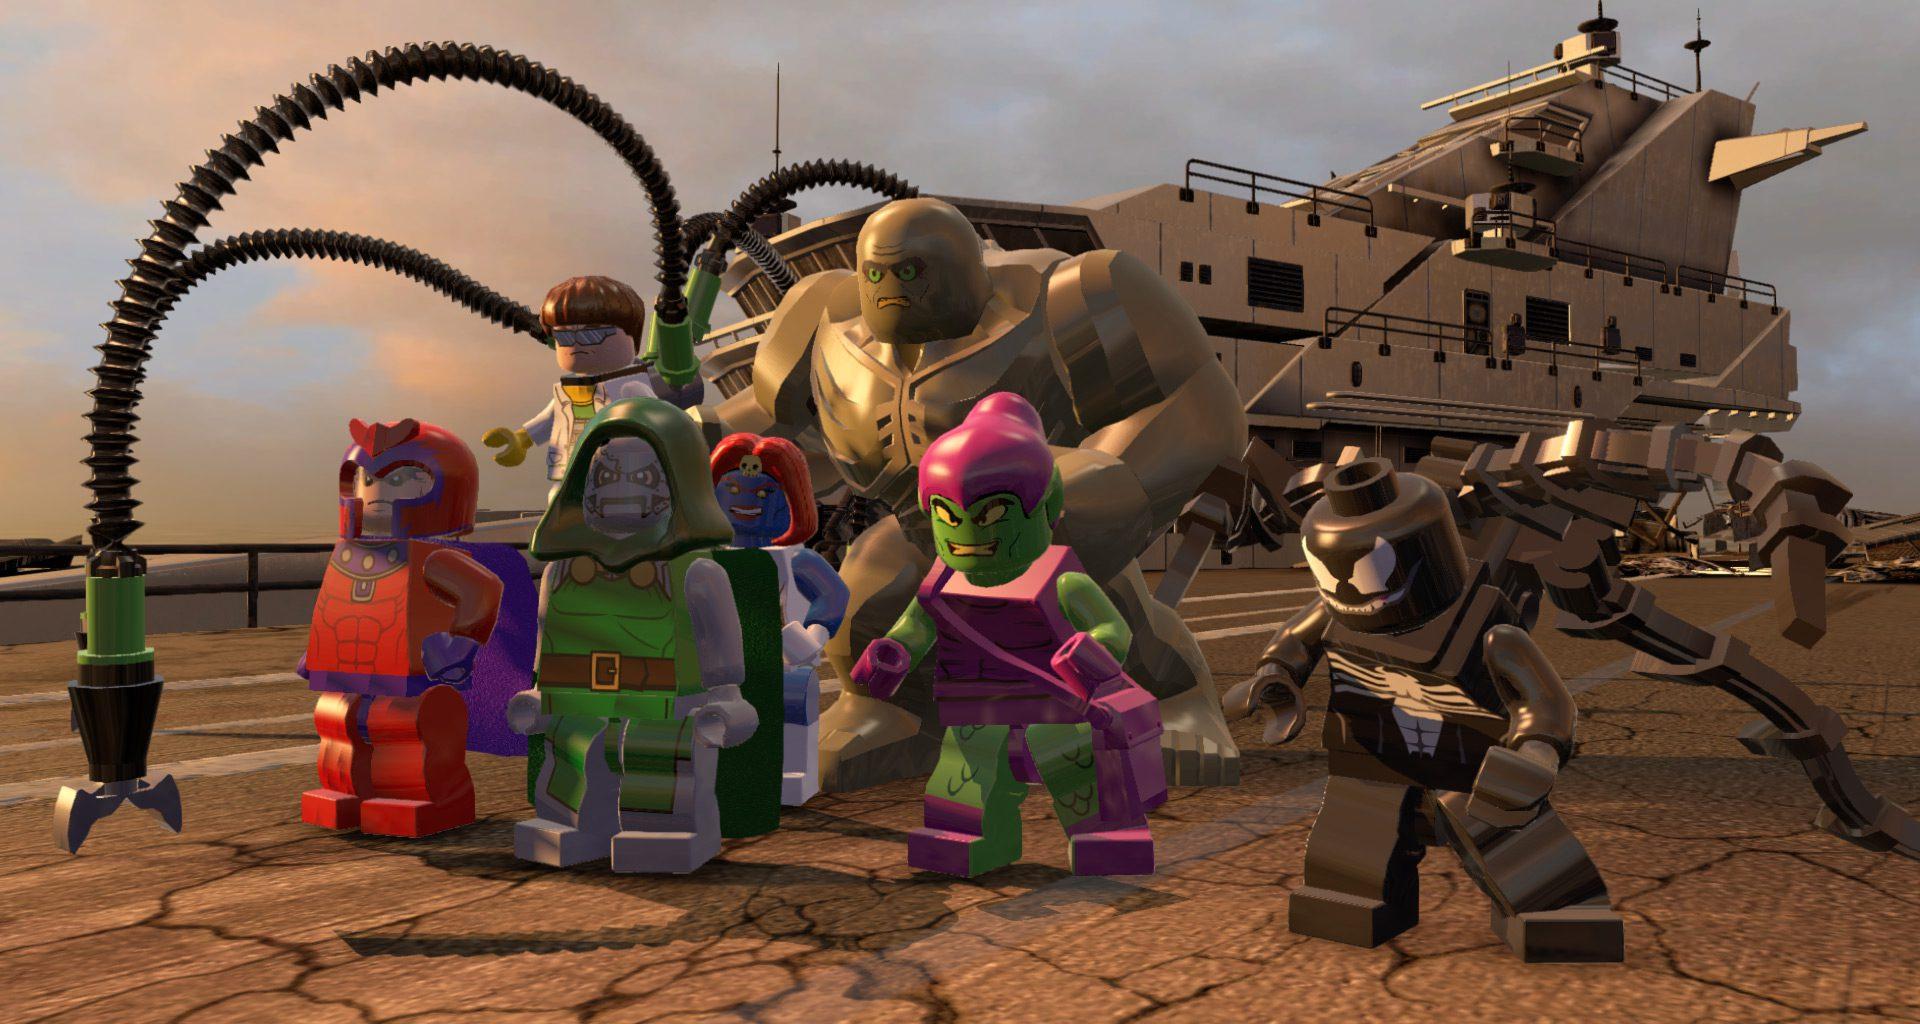 Green Goblin, Dr. Doom, Venom, and other villains in LEGO Marvel Super Heroes